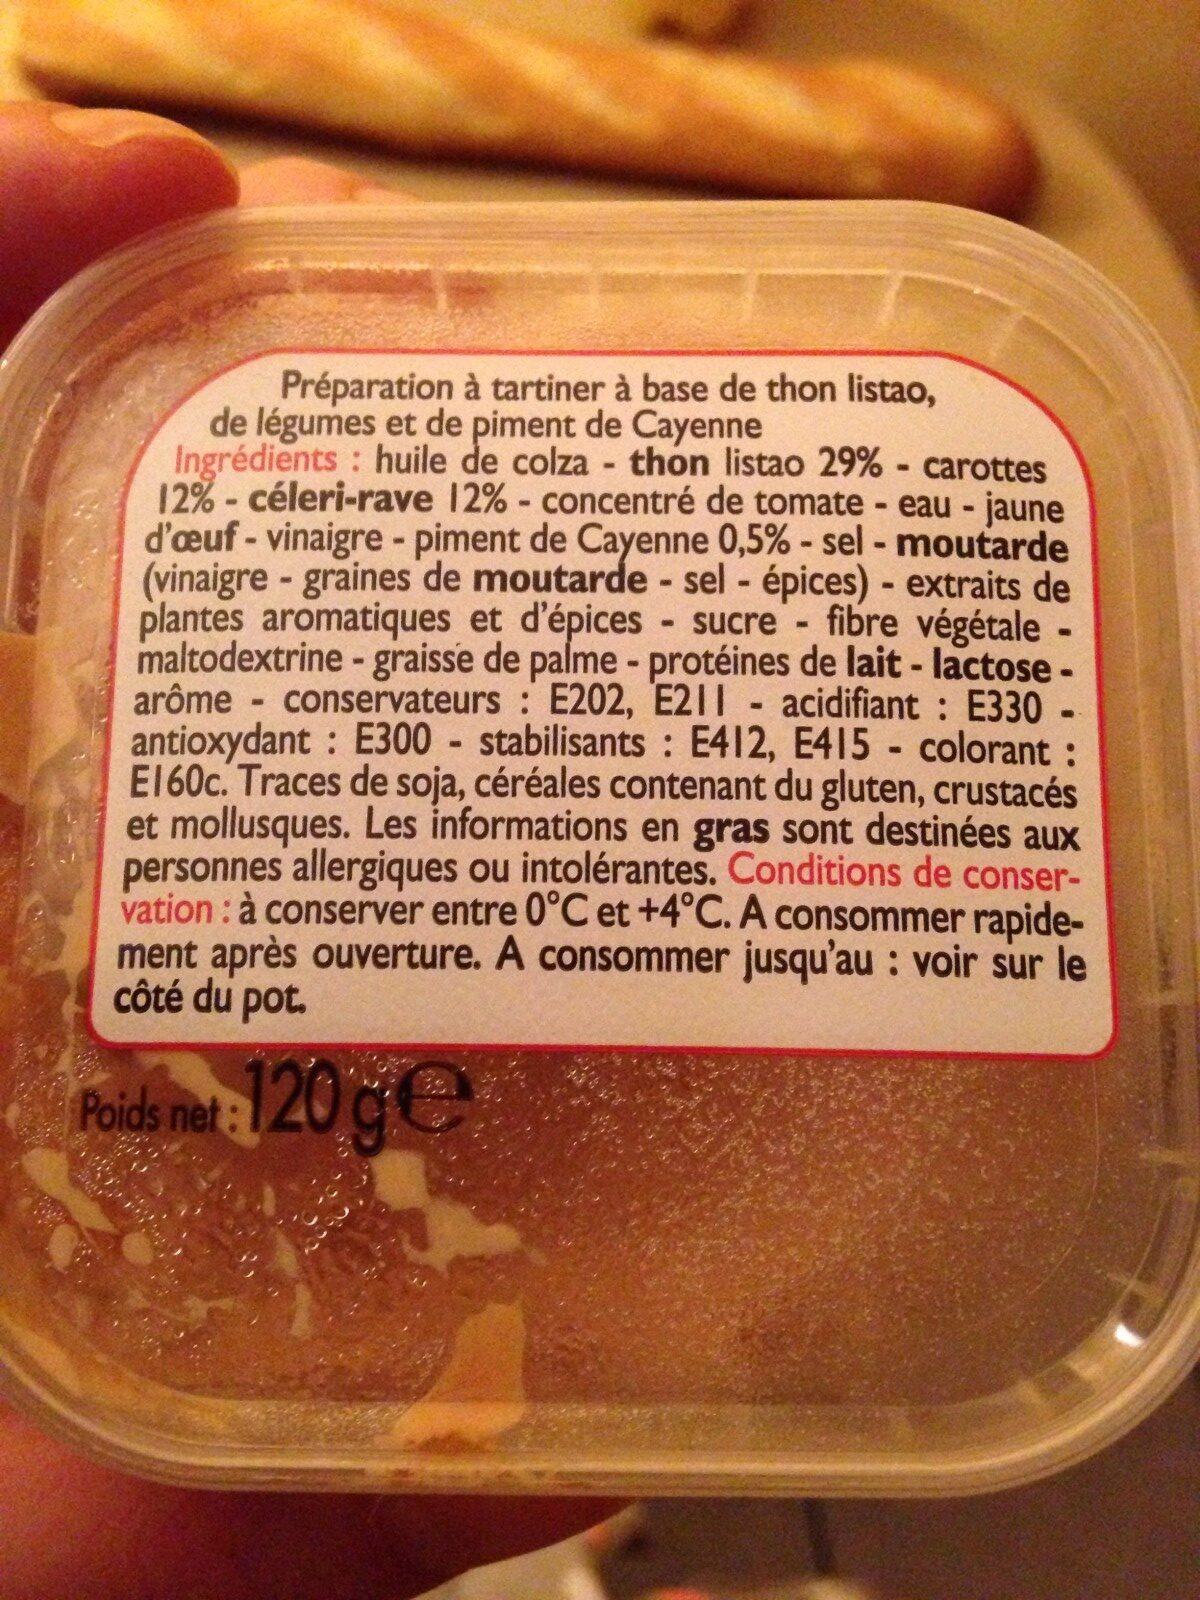 Thon piquant - Ingredients - fr